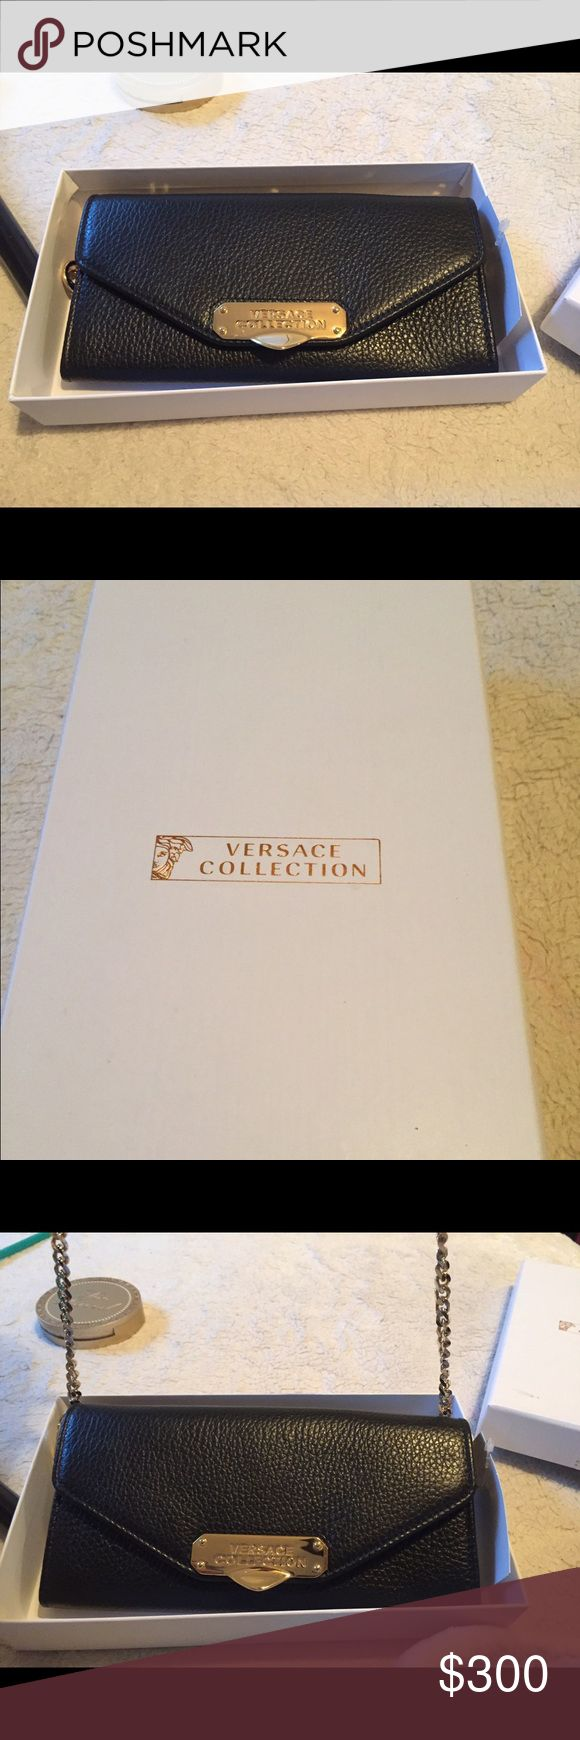 Versace wallet/satchel Versace wallet, Satchel, Versace bag